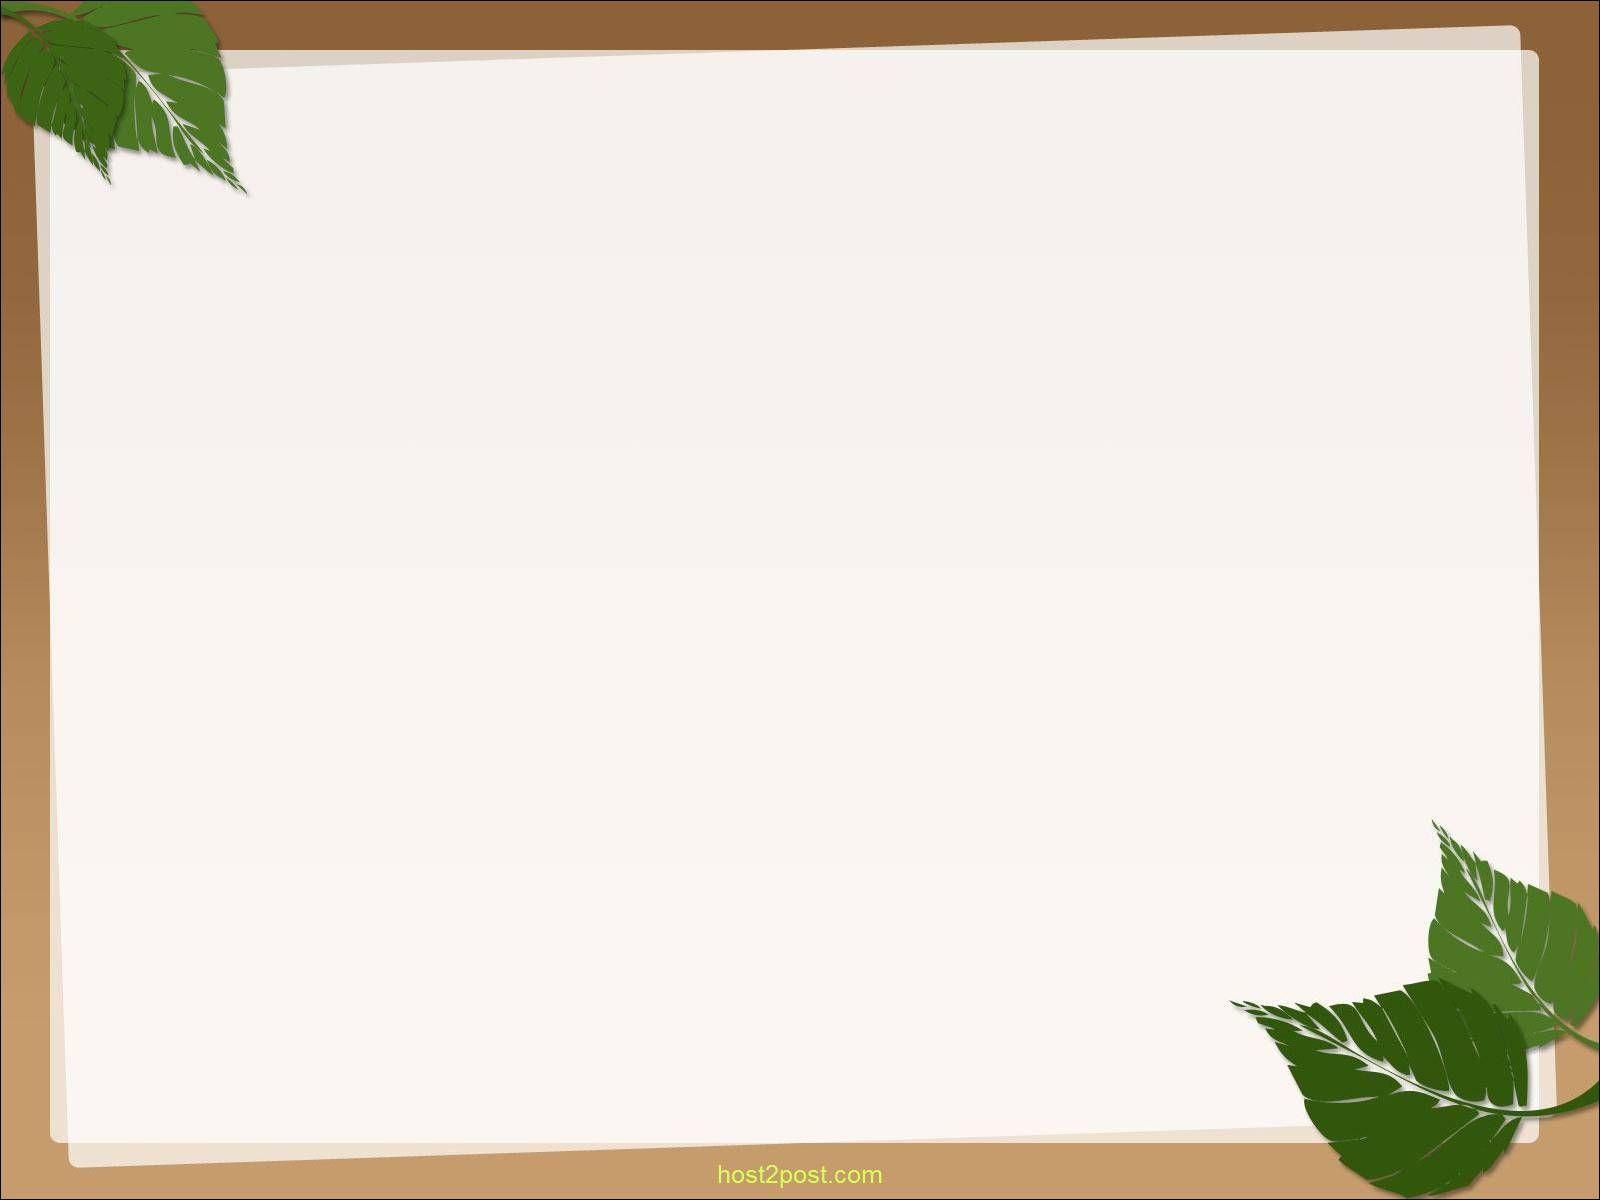 Animasi Bergerak Powerpoint Blog Baca Tulis Mobile Latar Belakang Tutorial Gambar Kartun Pemandangan